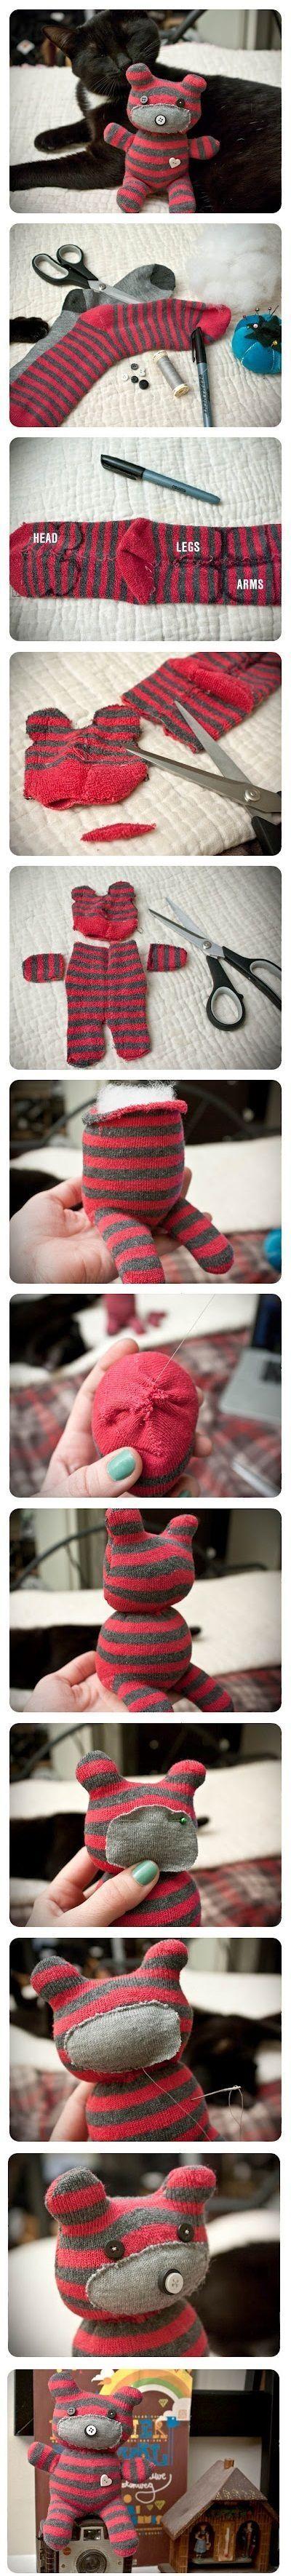 DIY Cute Little Teddy Bear. Cuter cat! :D